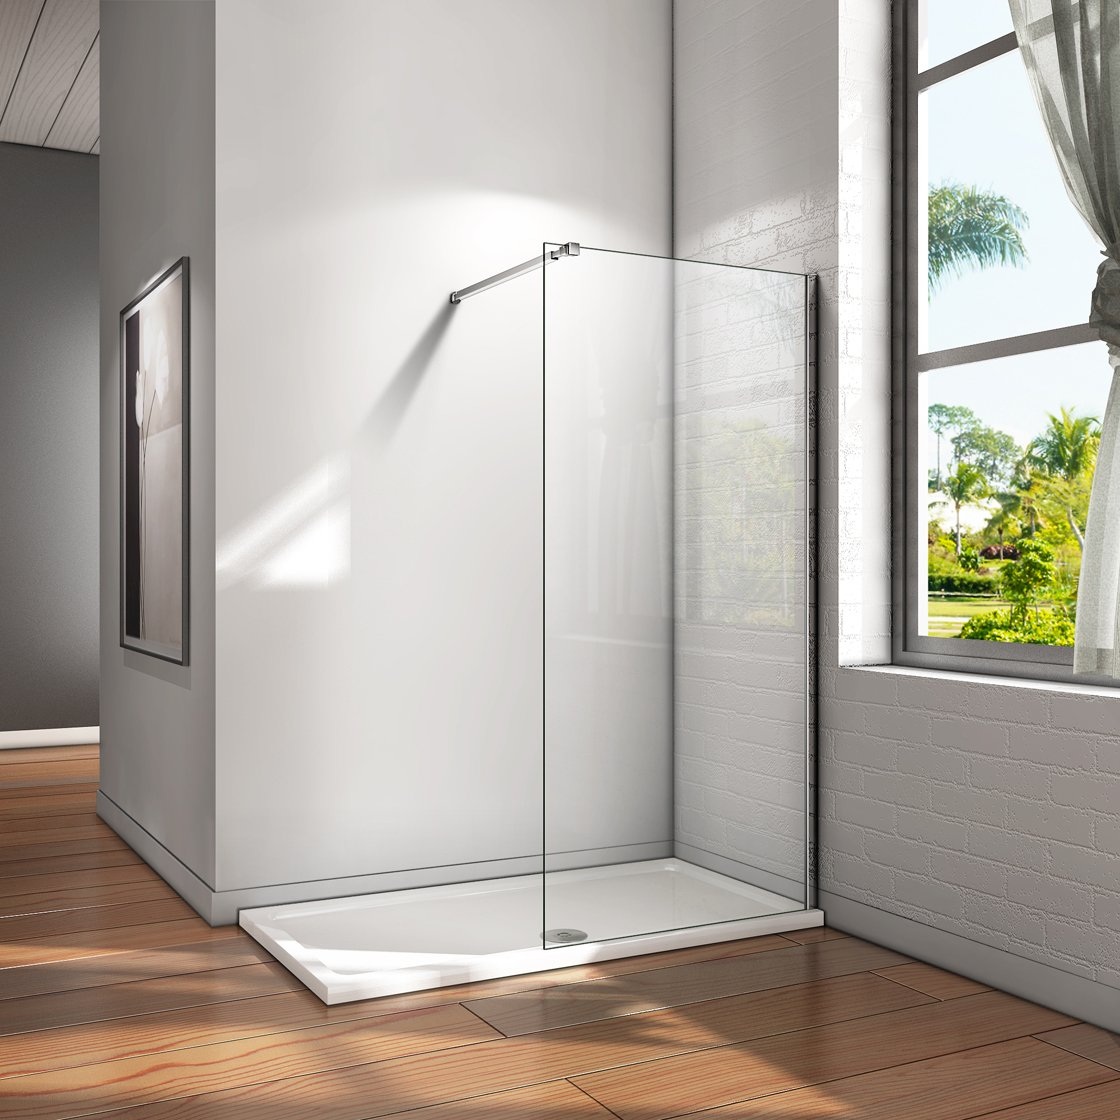 Mampara ducha Panel Pantalla Fija cristal 8mm templado para ba/ño Barra 73-120cm Panel 110x200cm